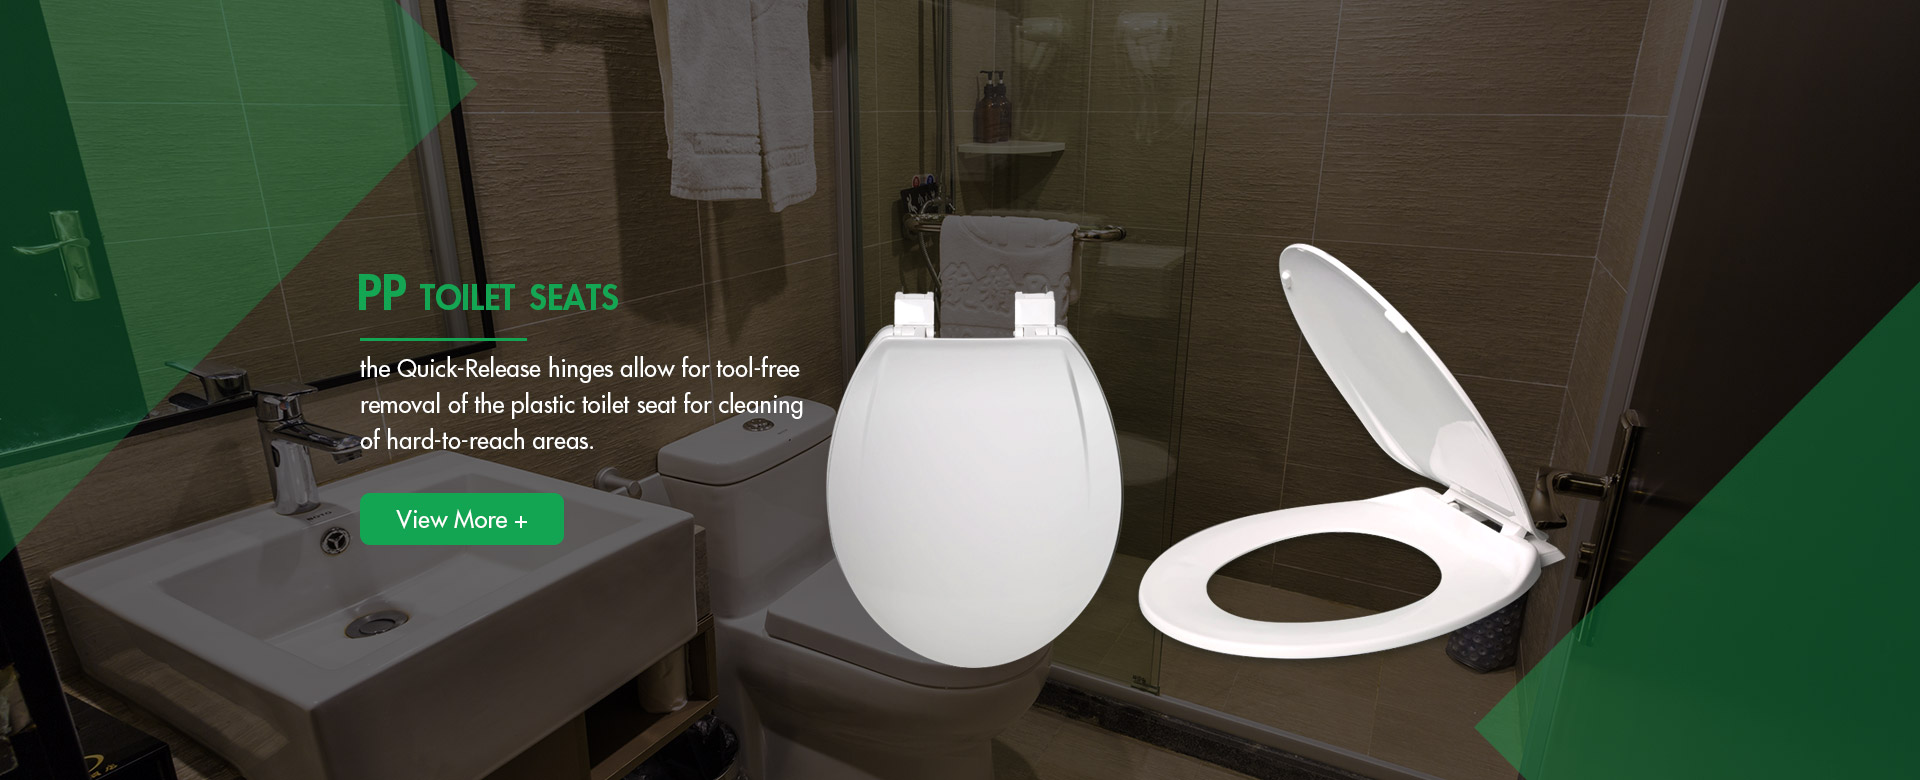 PP toilet seat